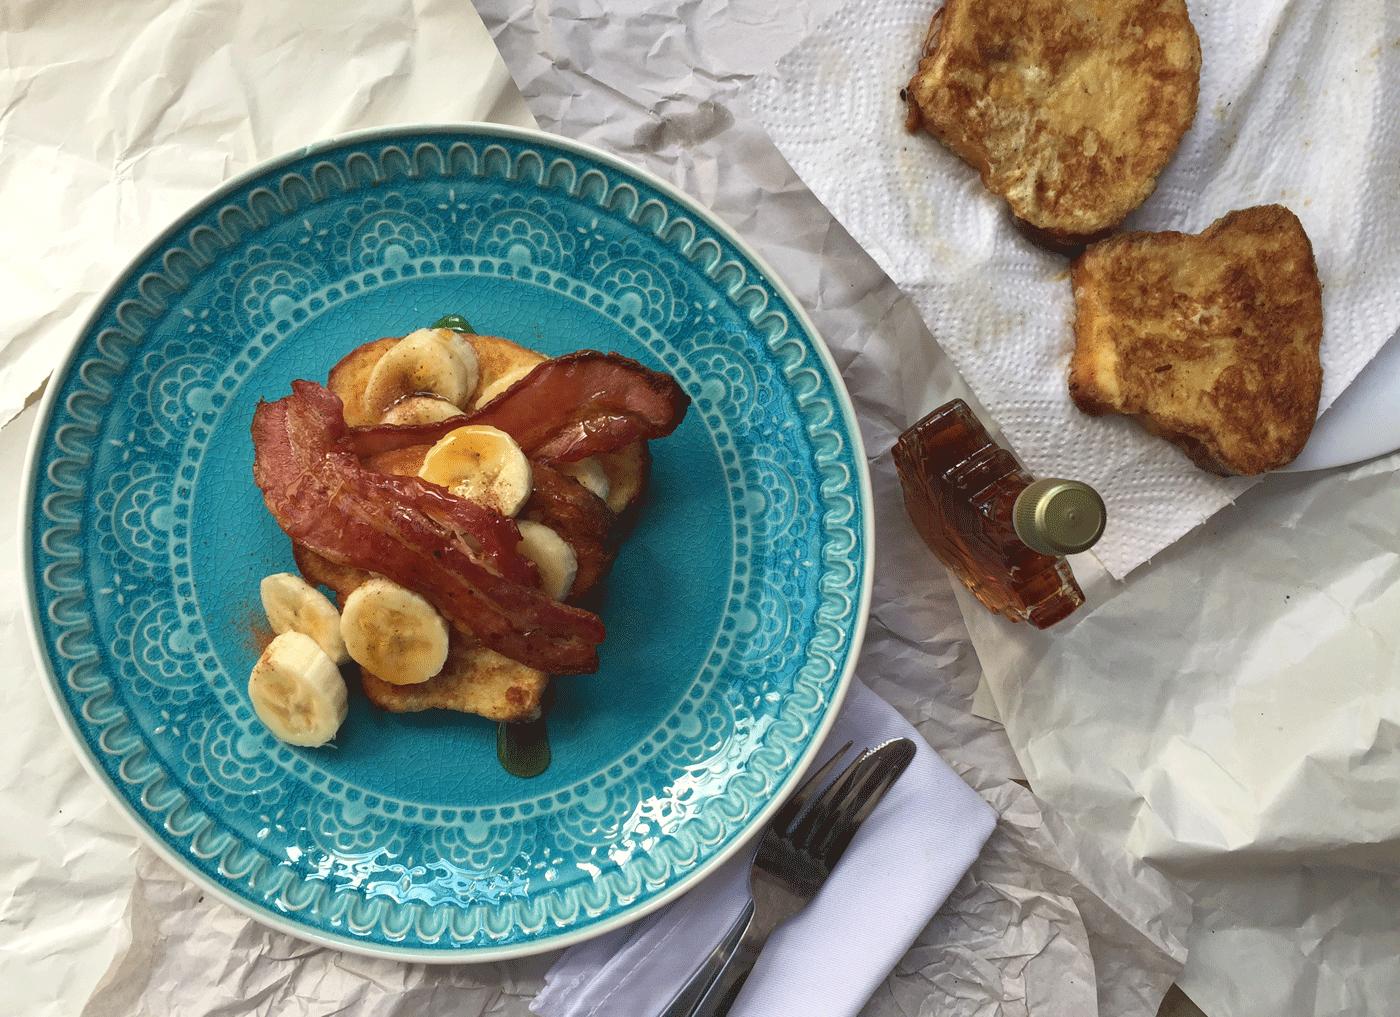 Madeira Cake French Toast with Crispy Bacon and Banana